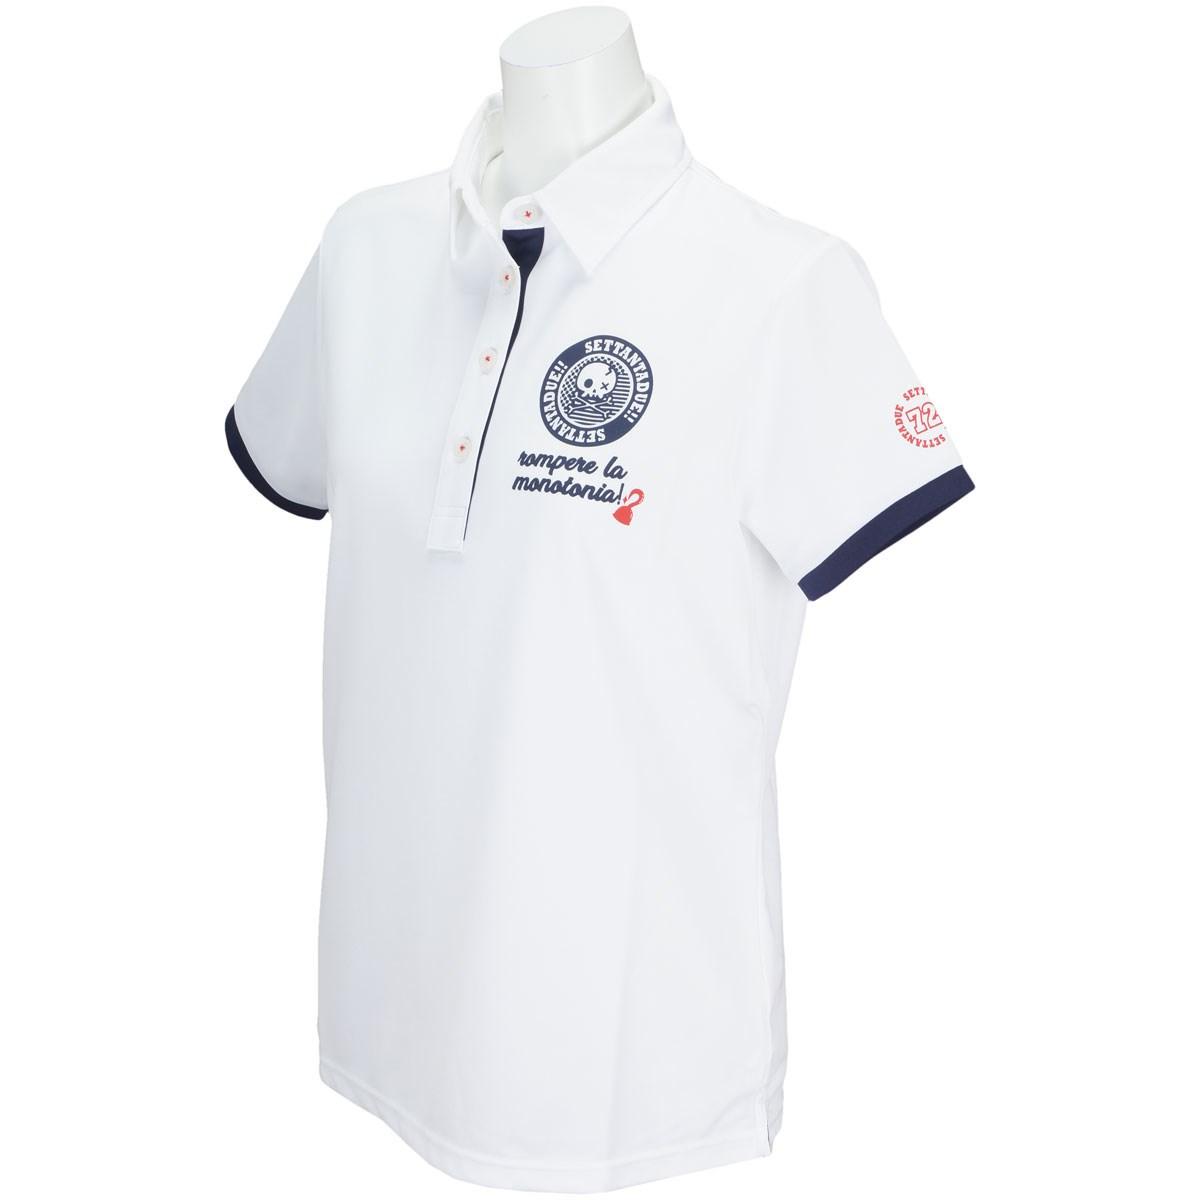 PAR72 パー72 半袖ポロシャツ S ホワイト レディス